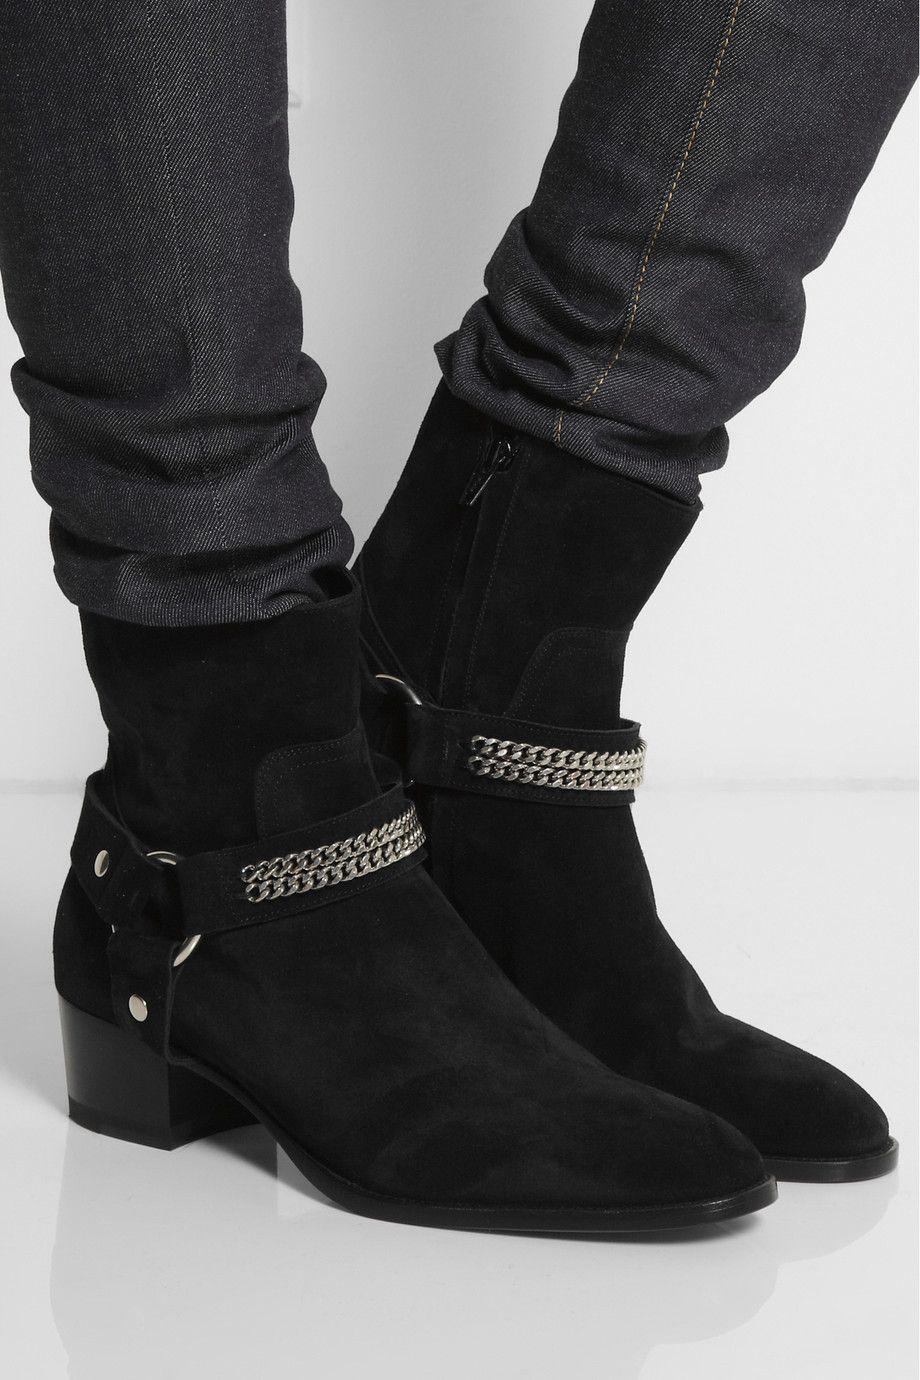 Saint Laurent - Chain-trimmed suede ankle boots